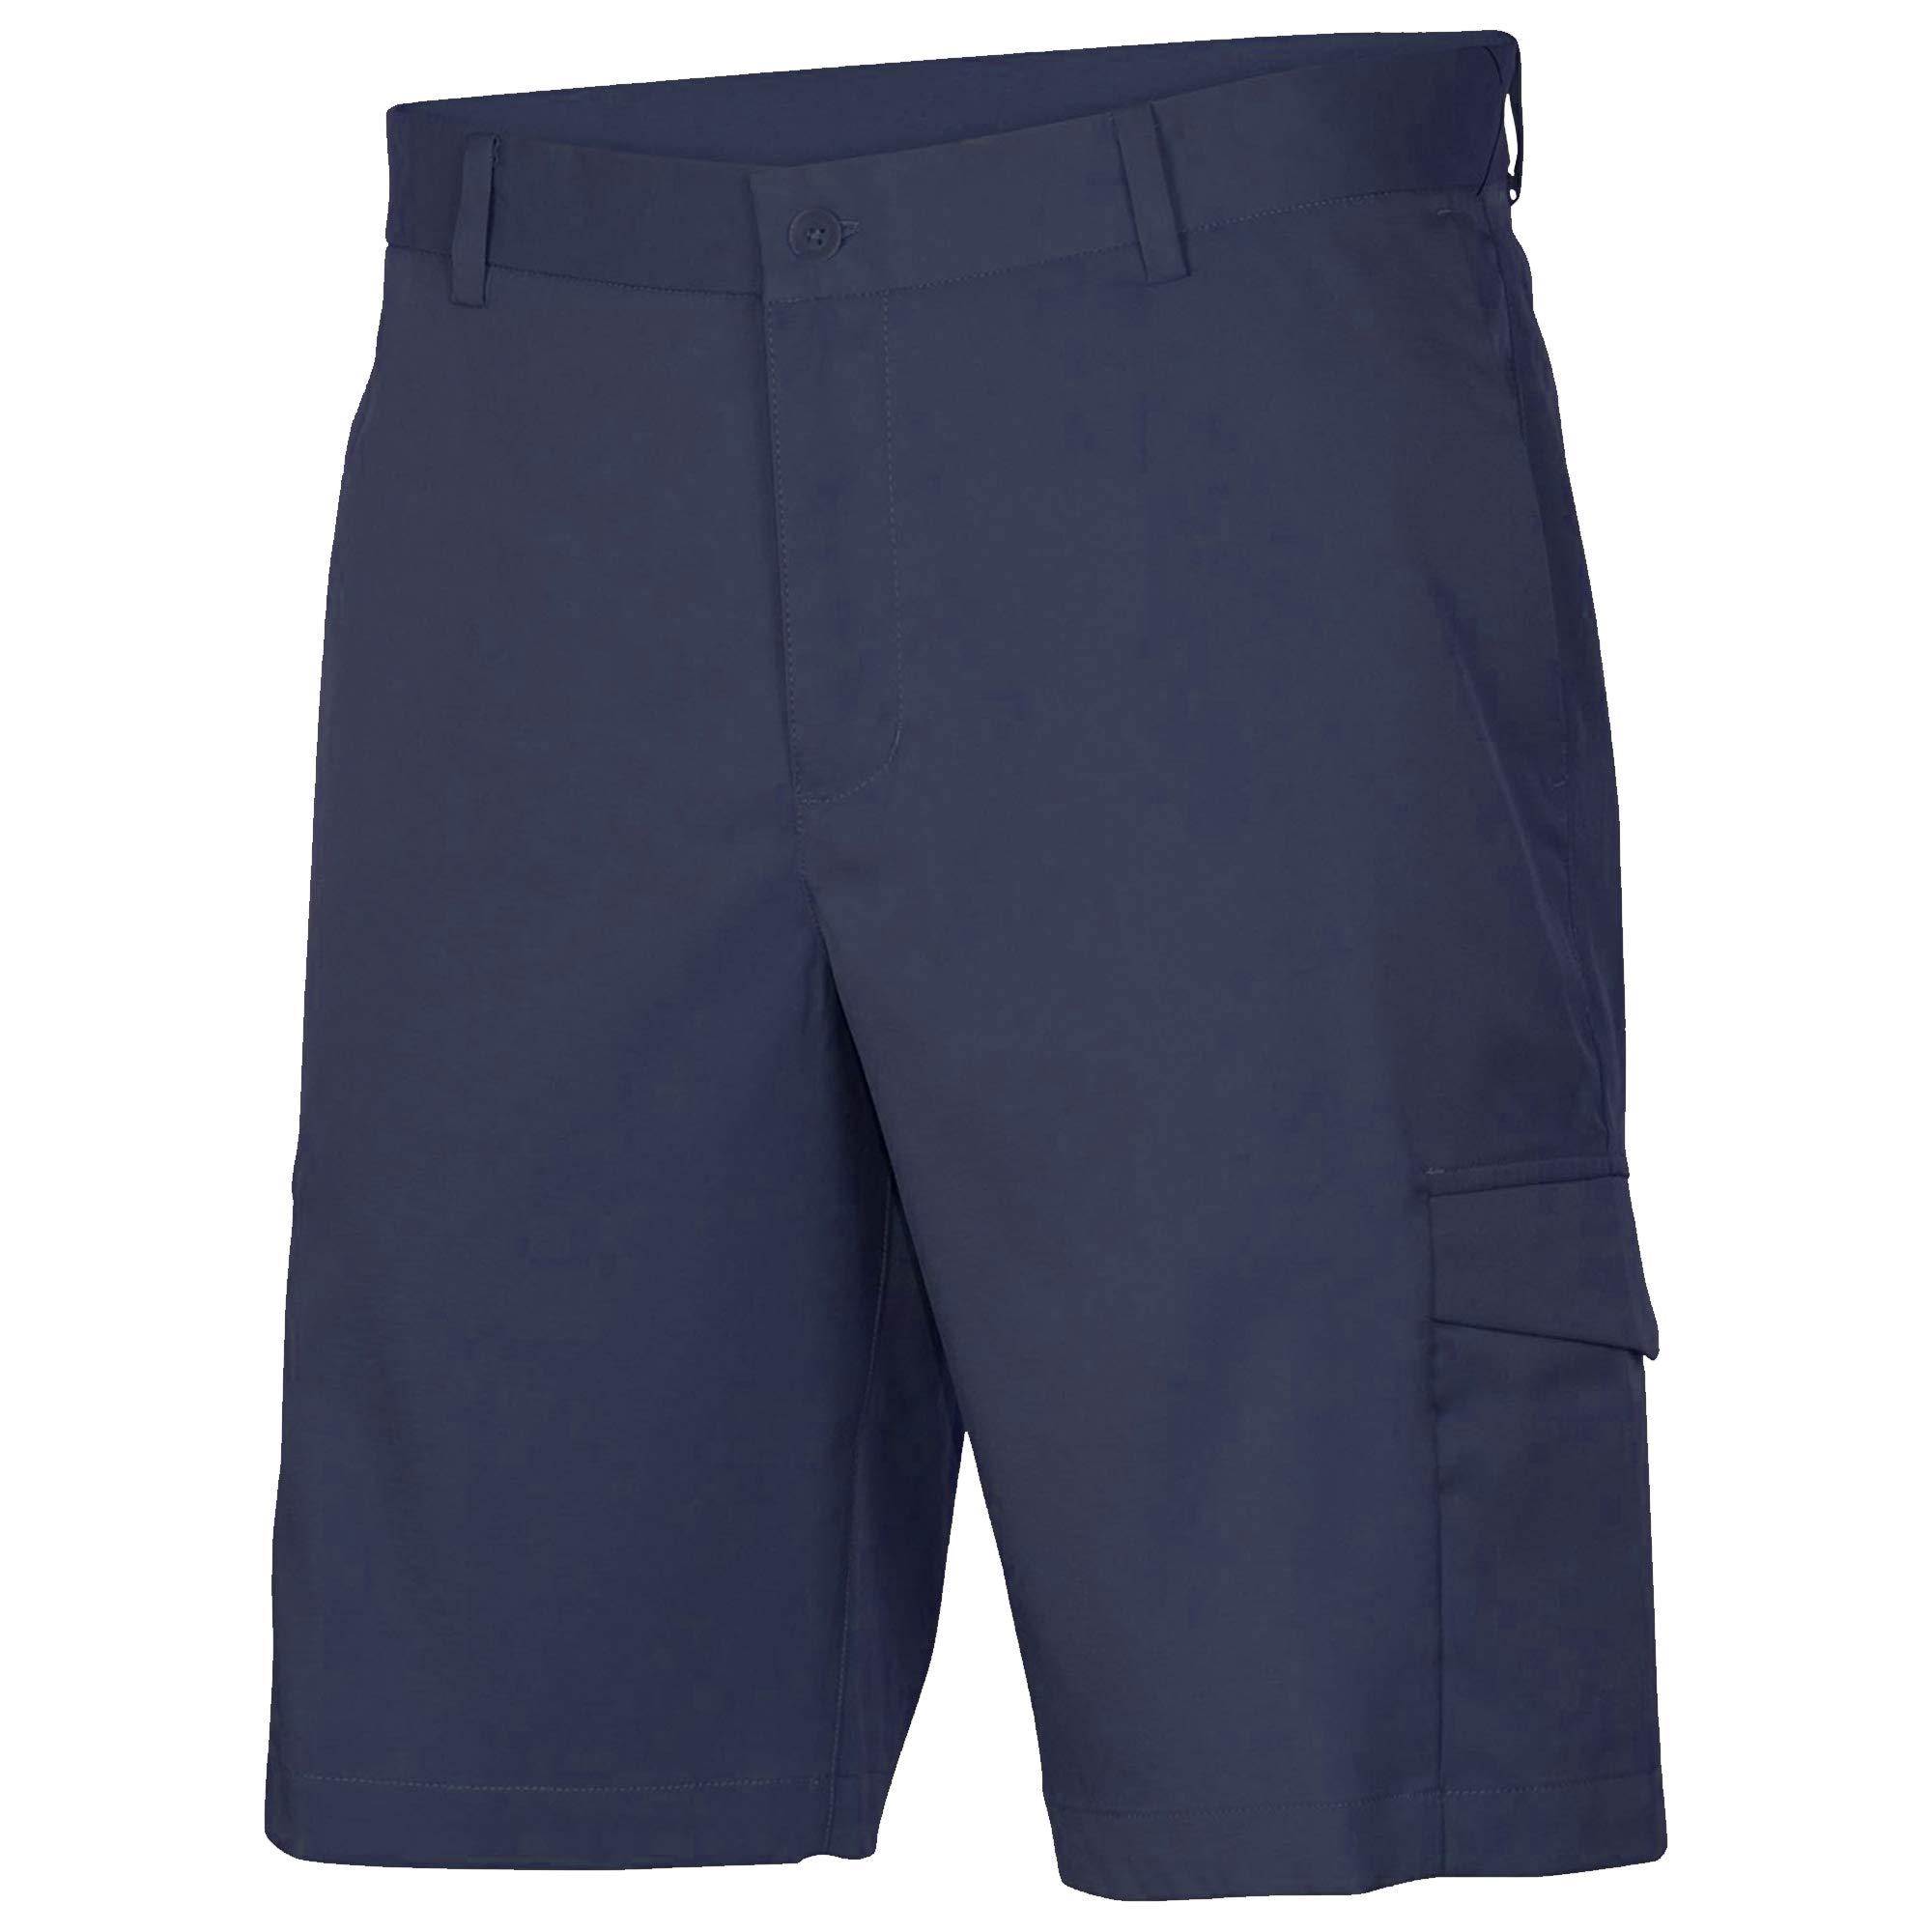 Nike Flex Standard-Fit Cargo Men's Golf Shorts 882086 410 (38) Navy by Nike